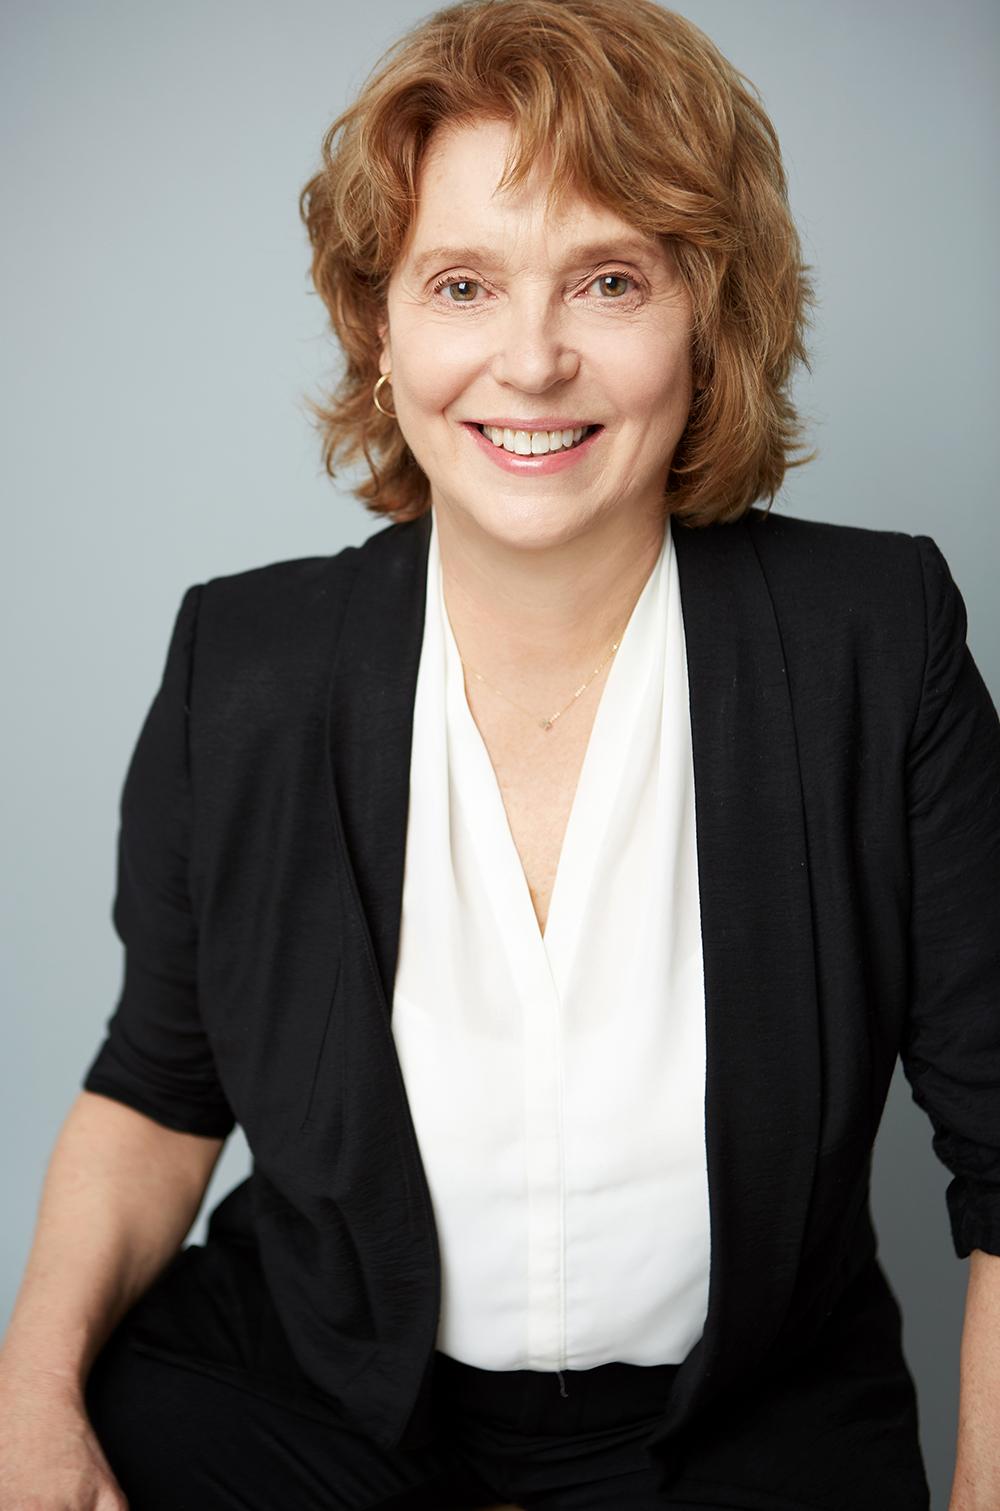 Jill Conway